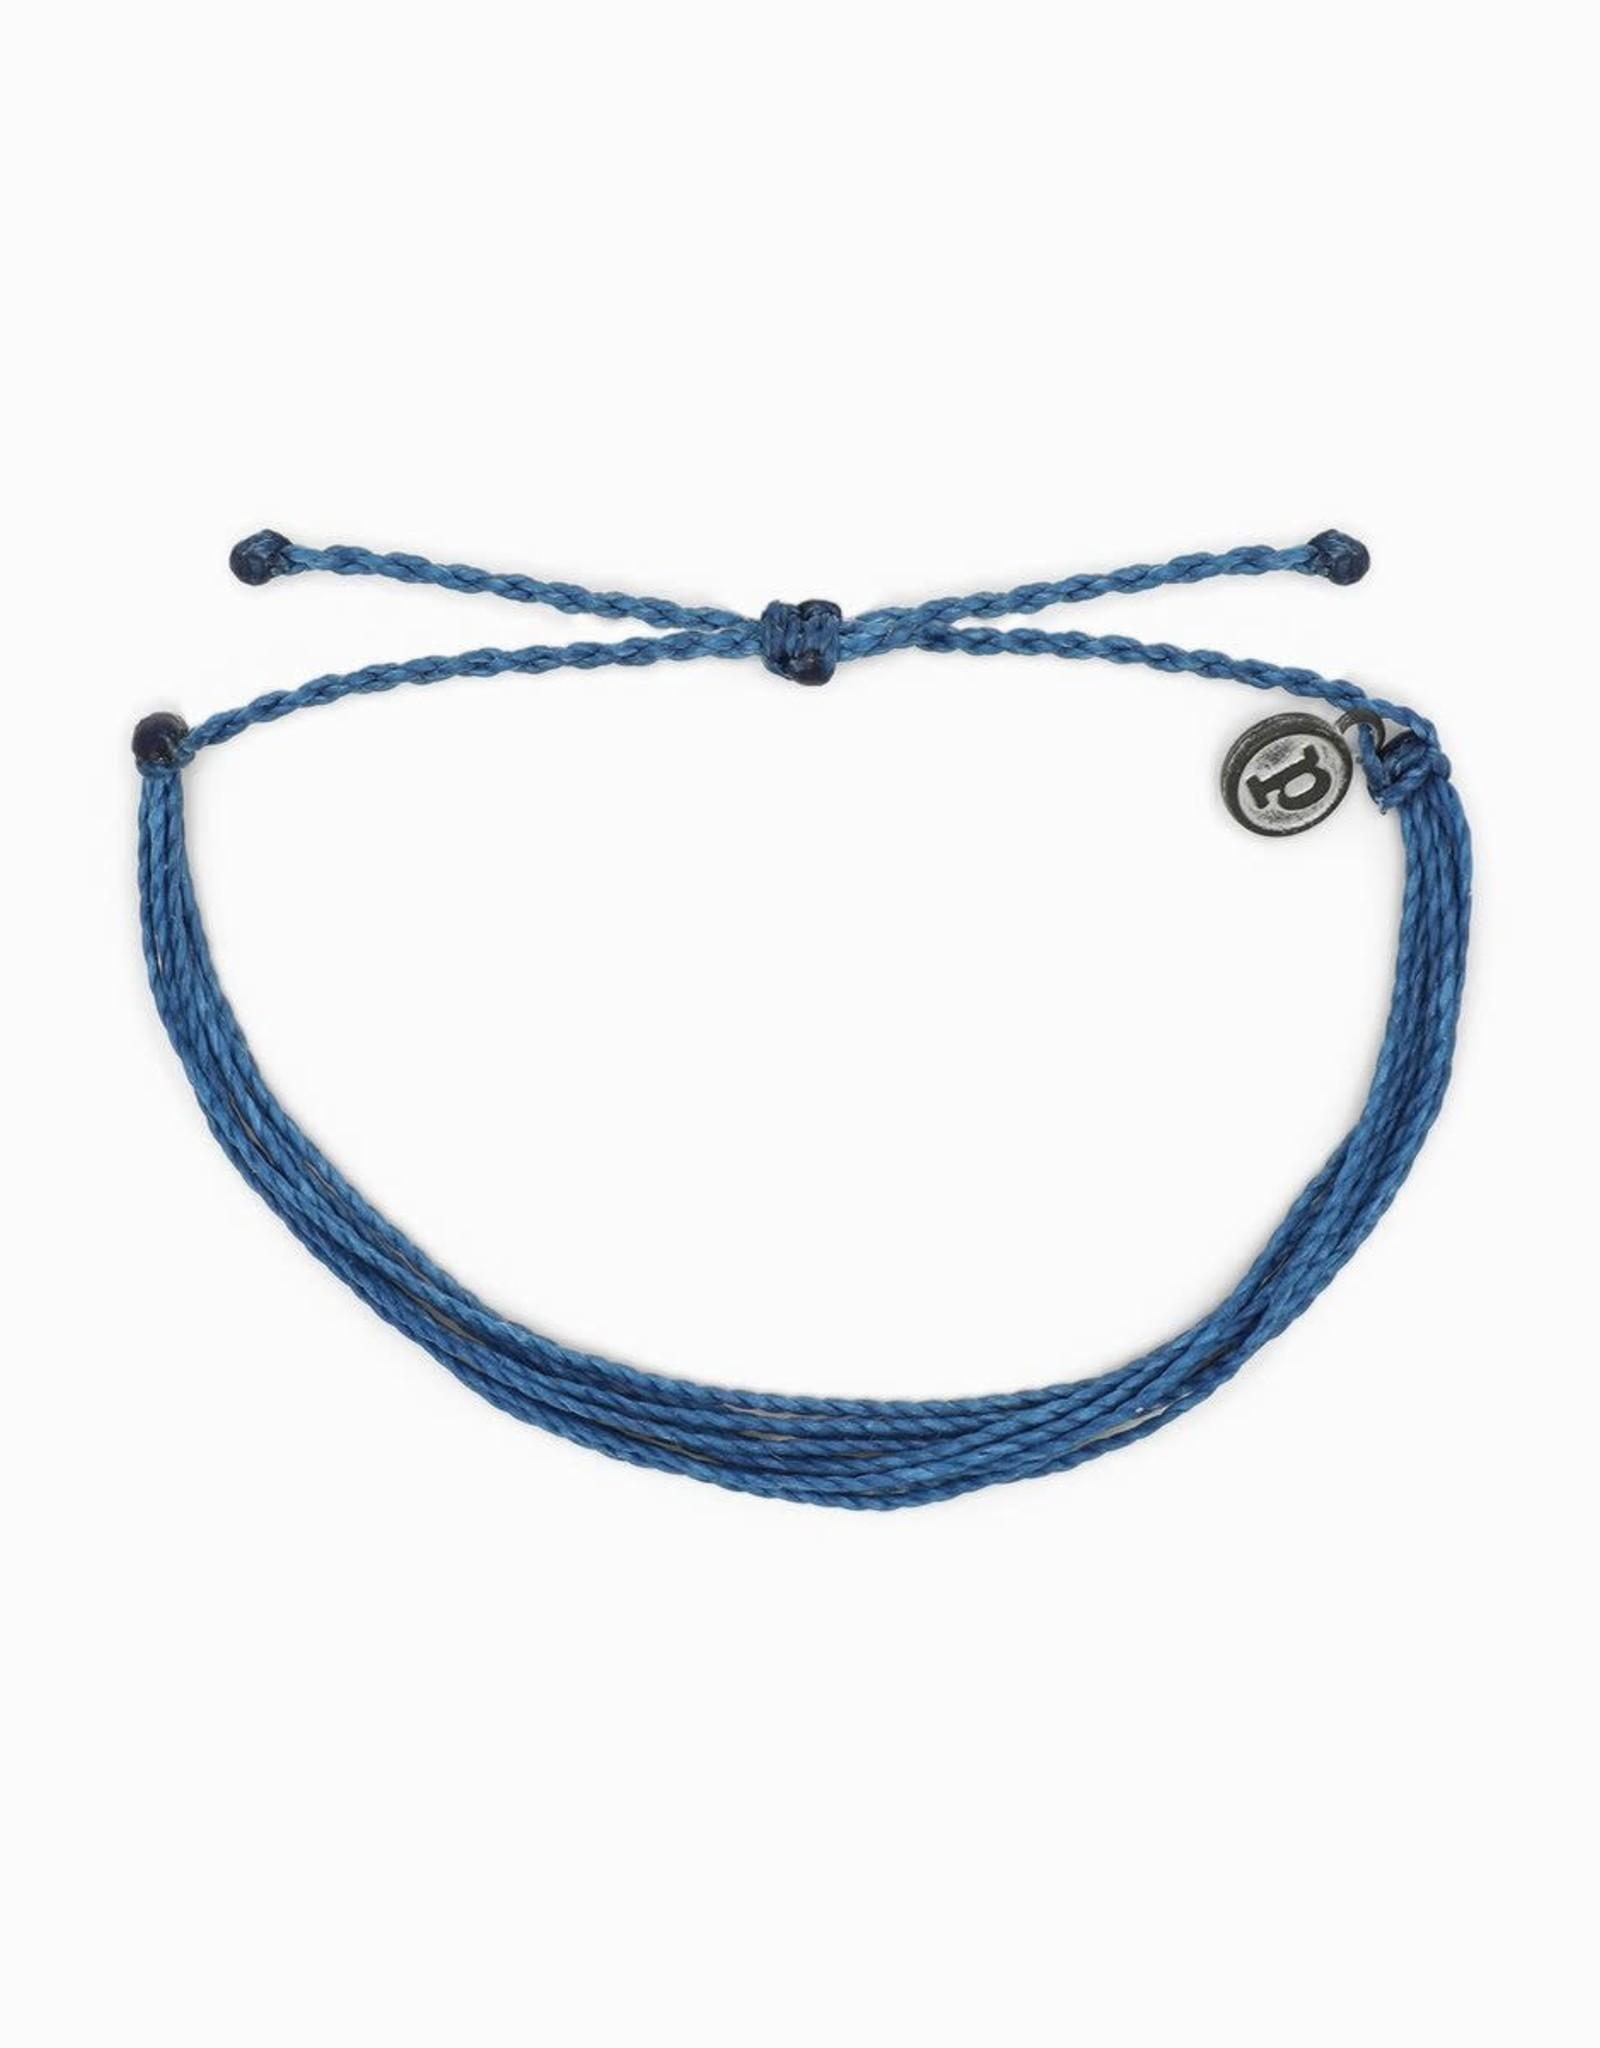 ORIGINAL Bracelet, DARK BLUE MARINE